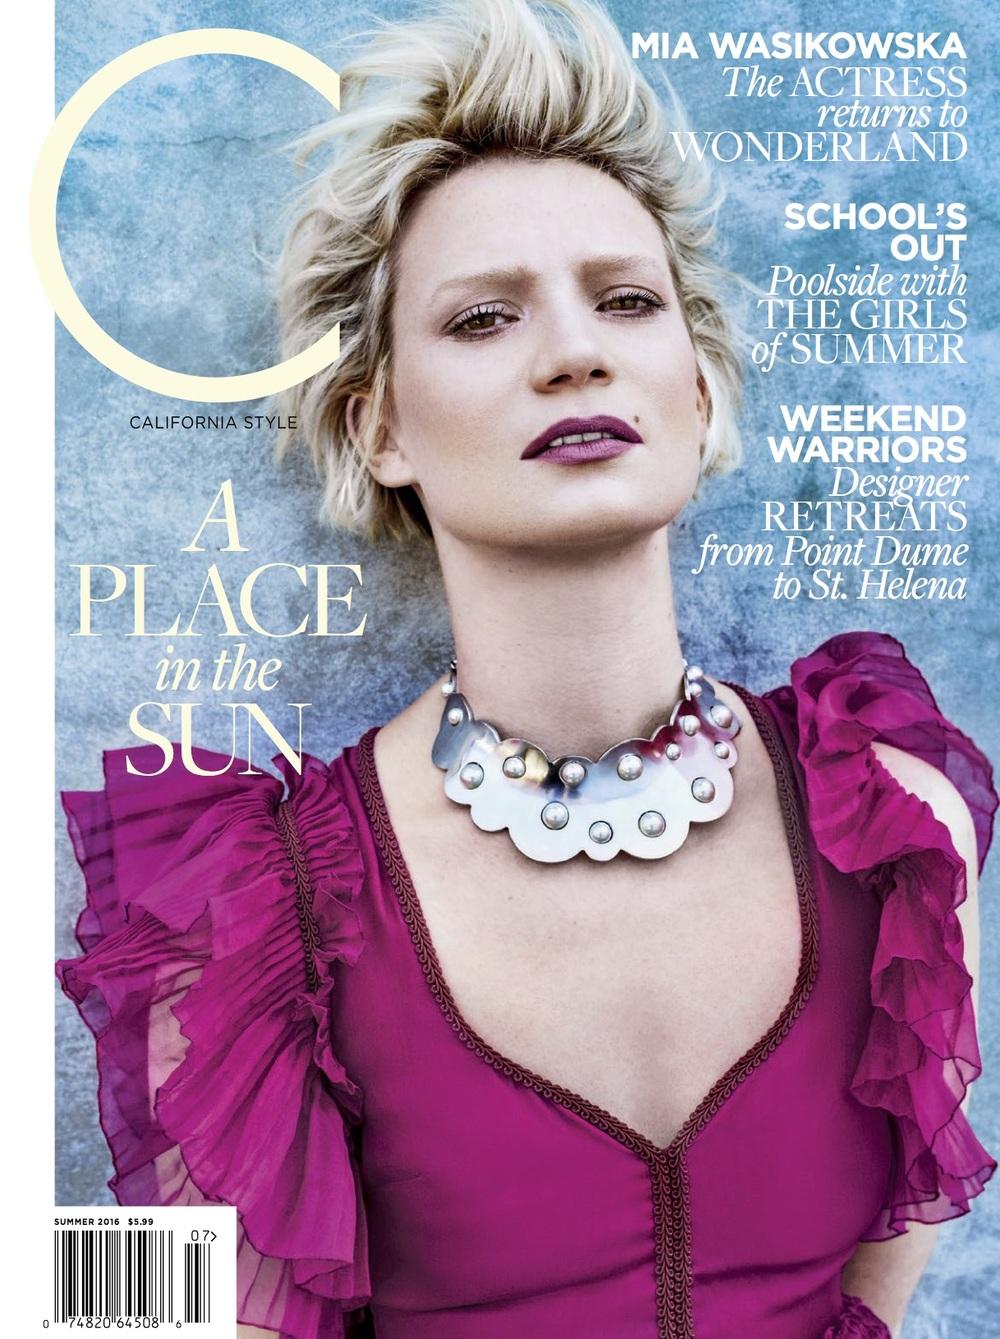 C Magazine (Summer 2016)